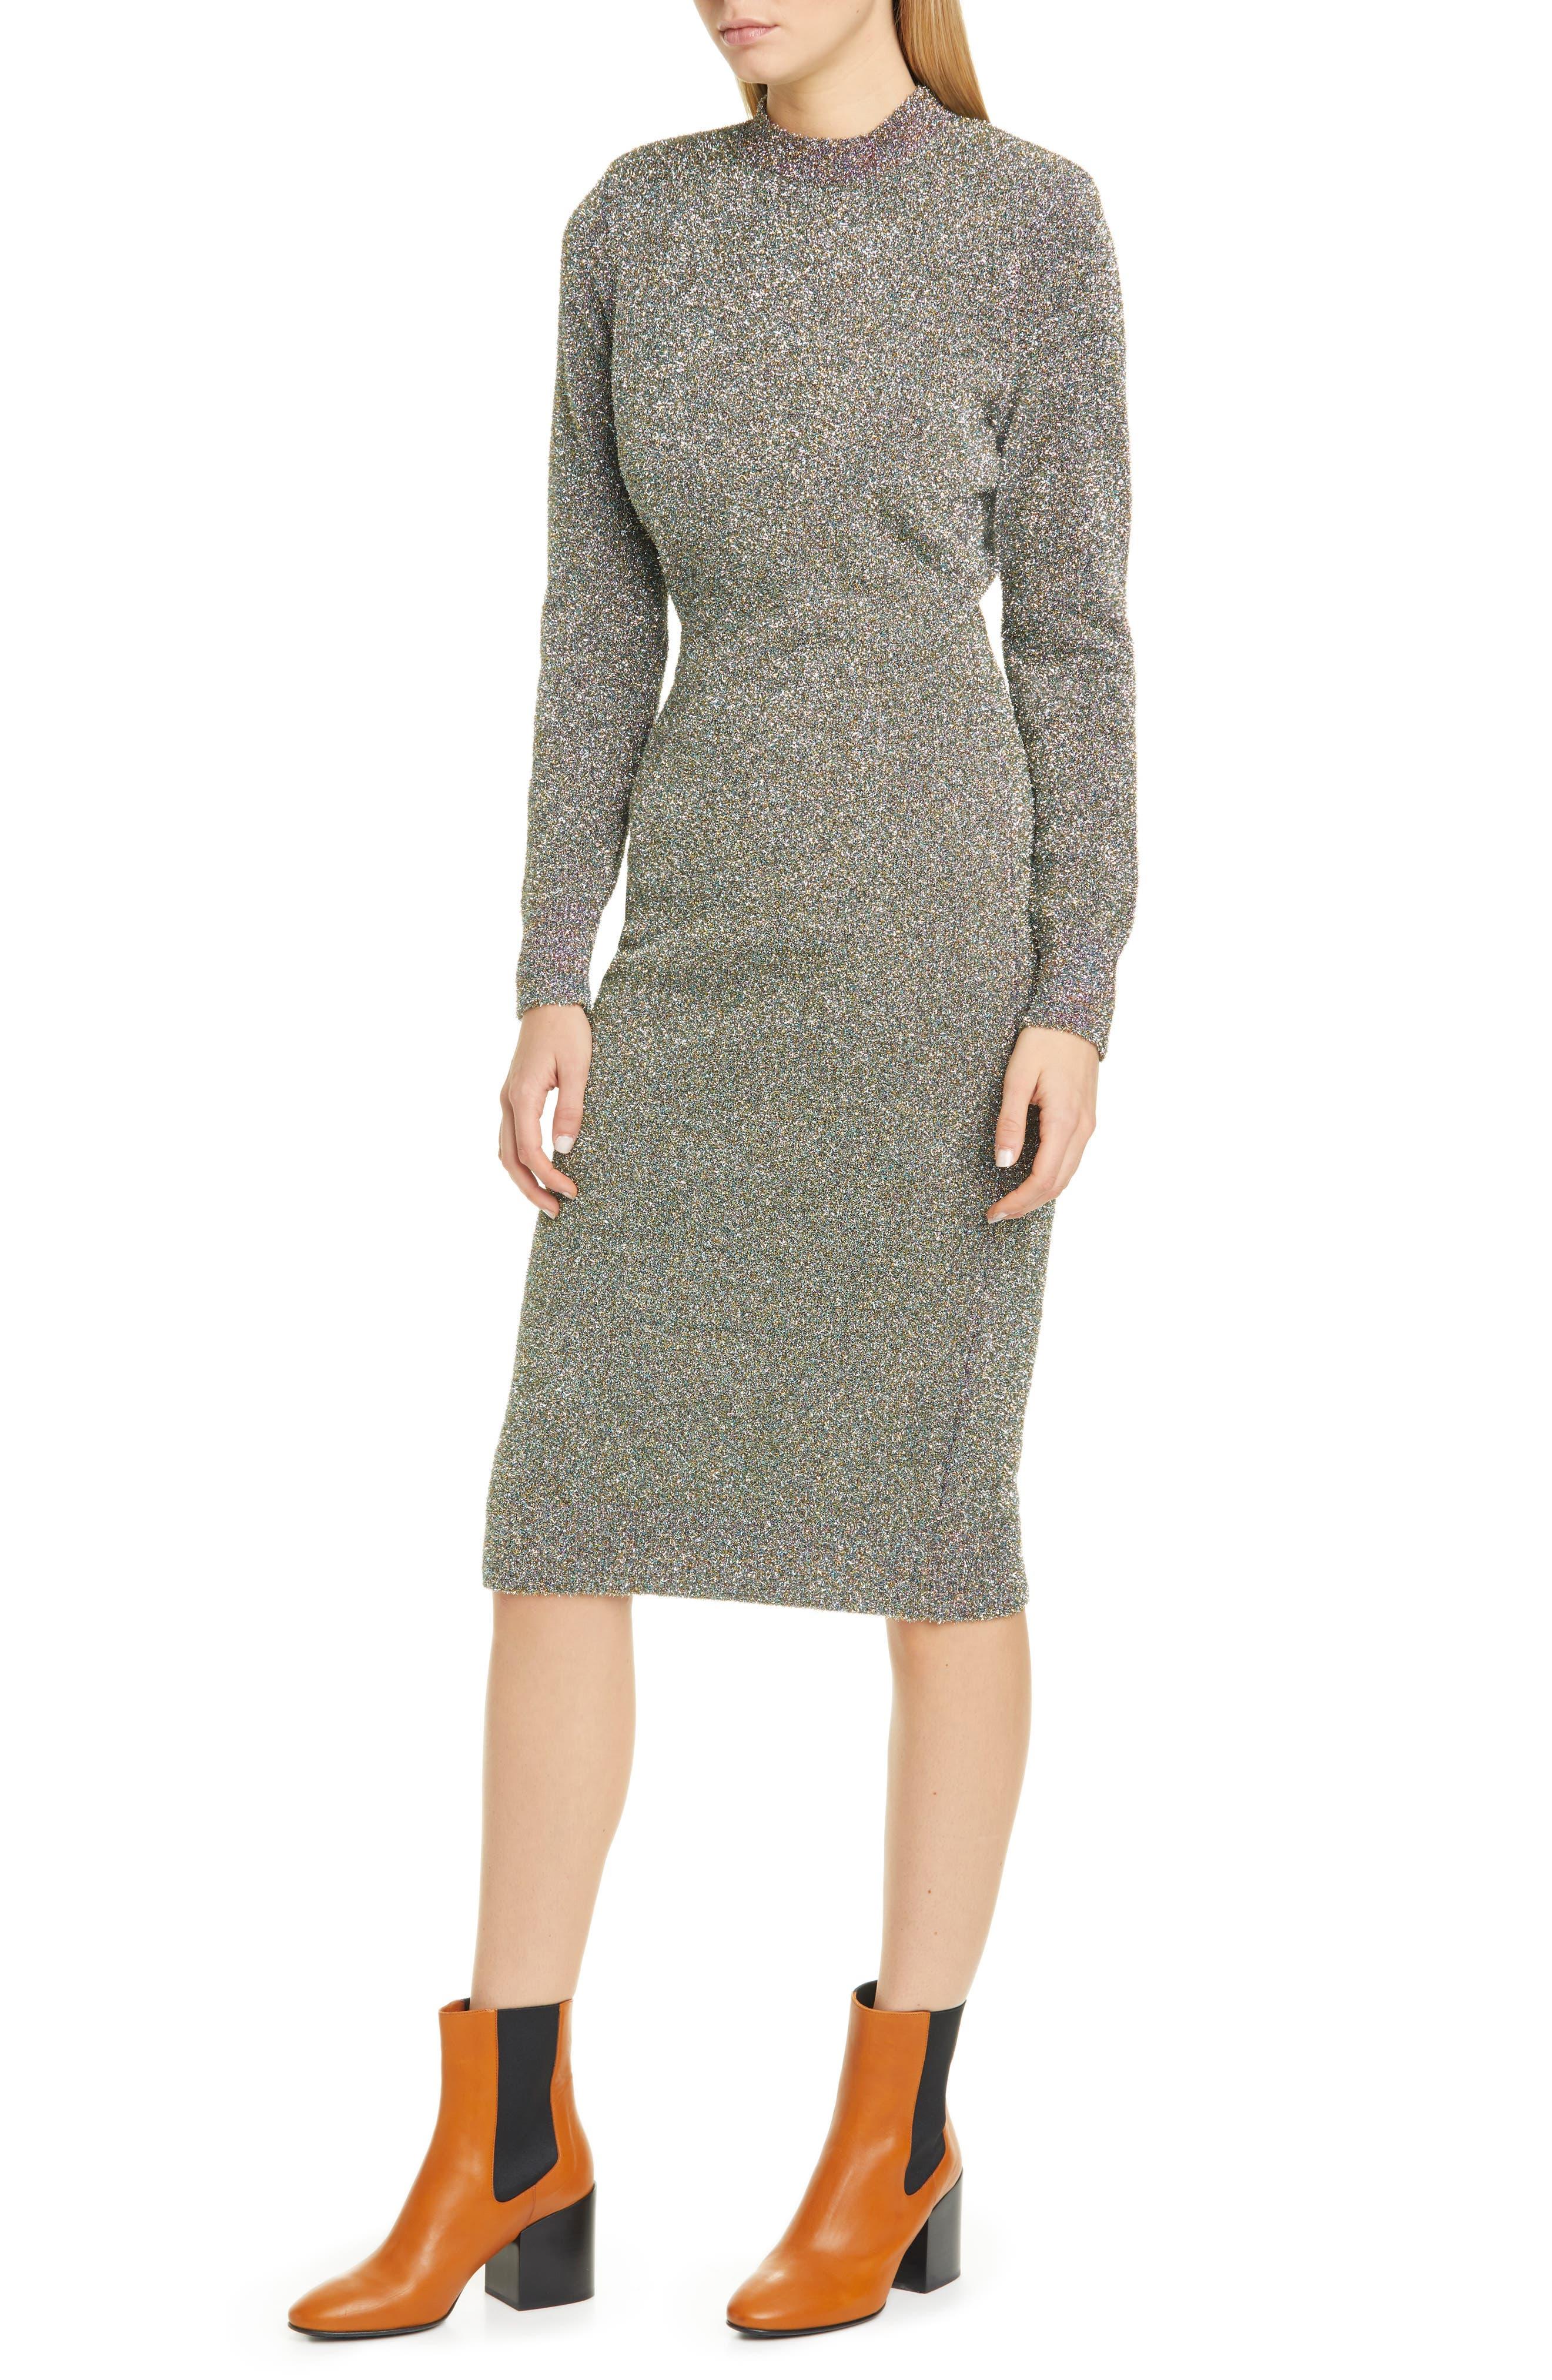 Dries Van Noten Dress Metallic Long Sleeve Dress